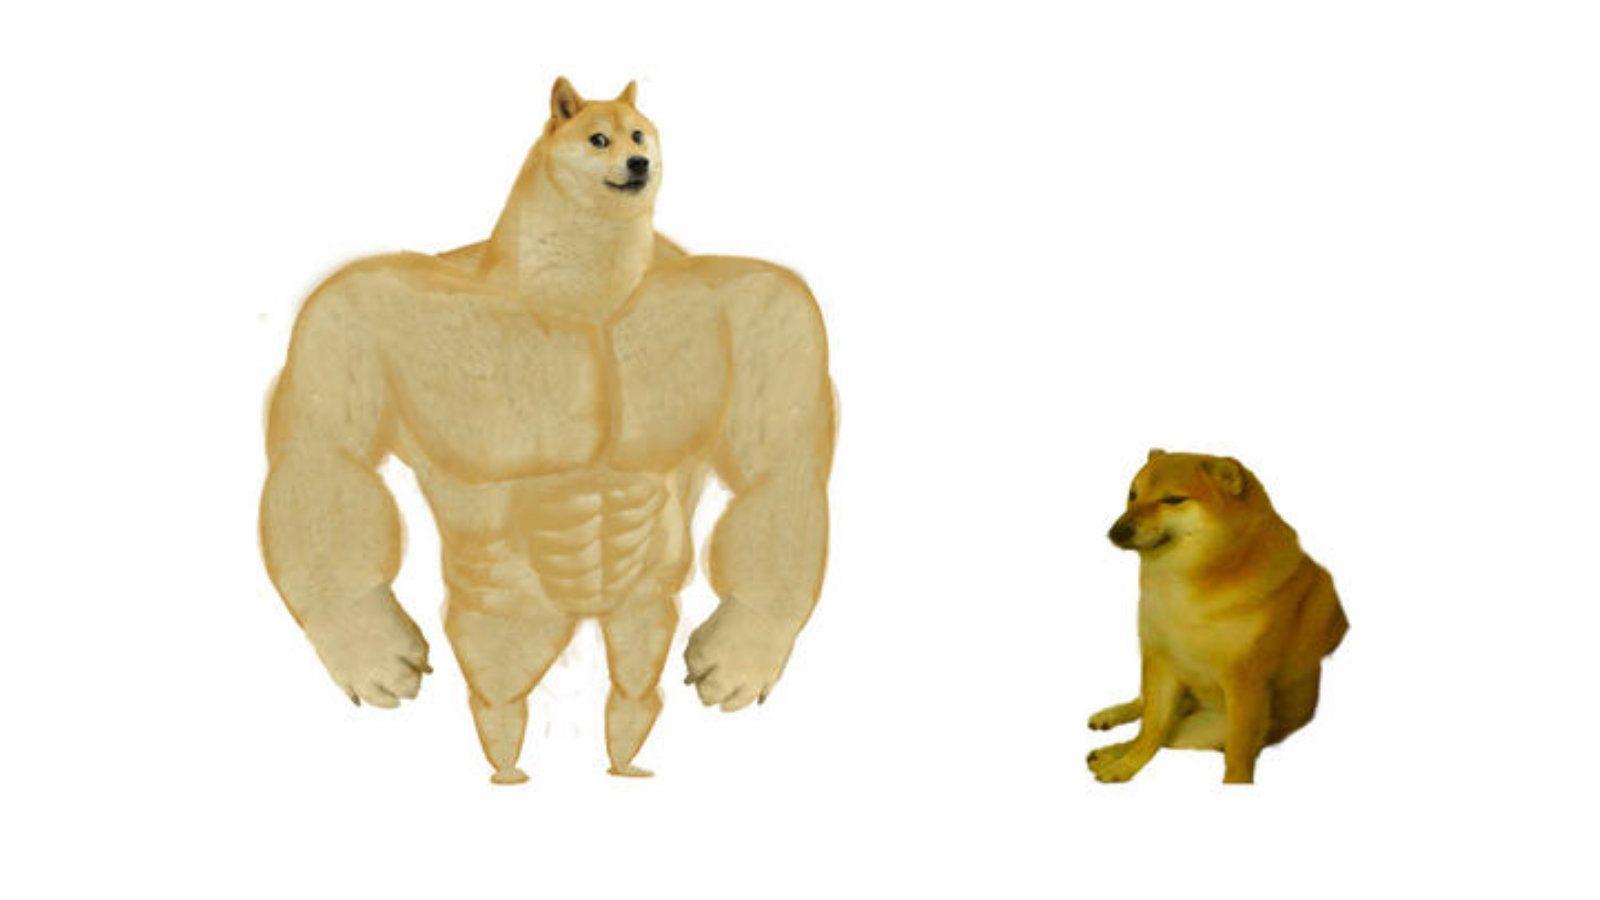 Swole Doge Vs Cheems In 2020 Doge Meme Meme Template Create Memes